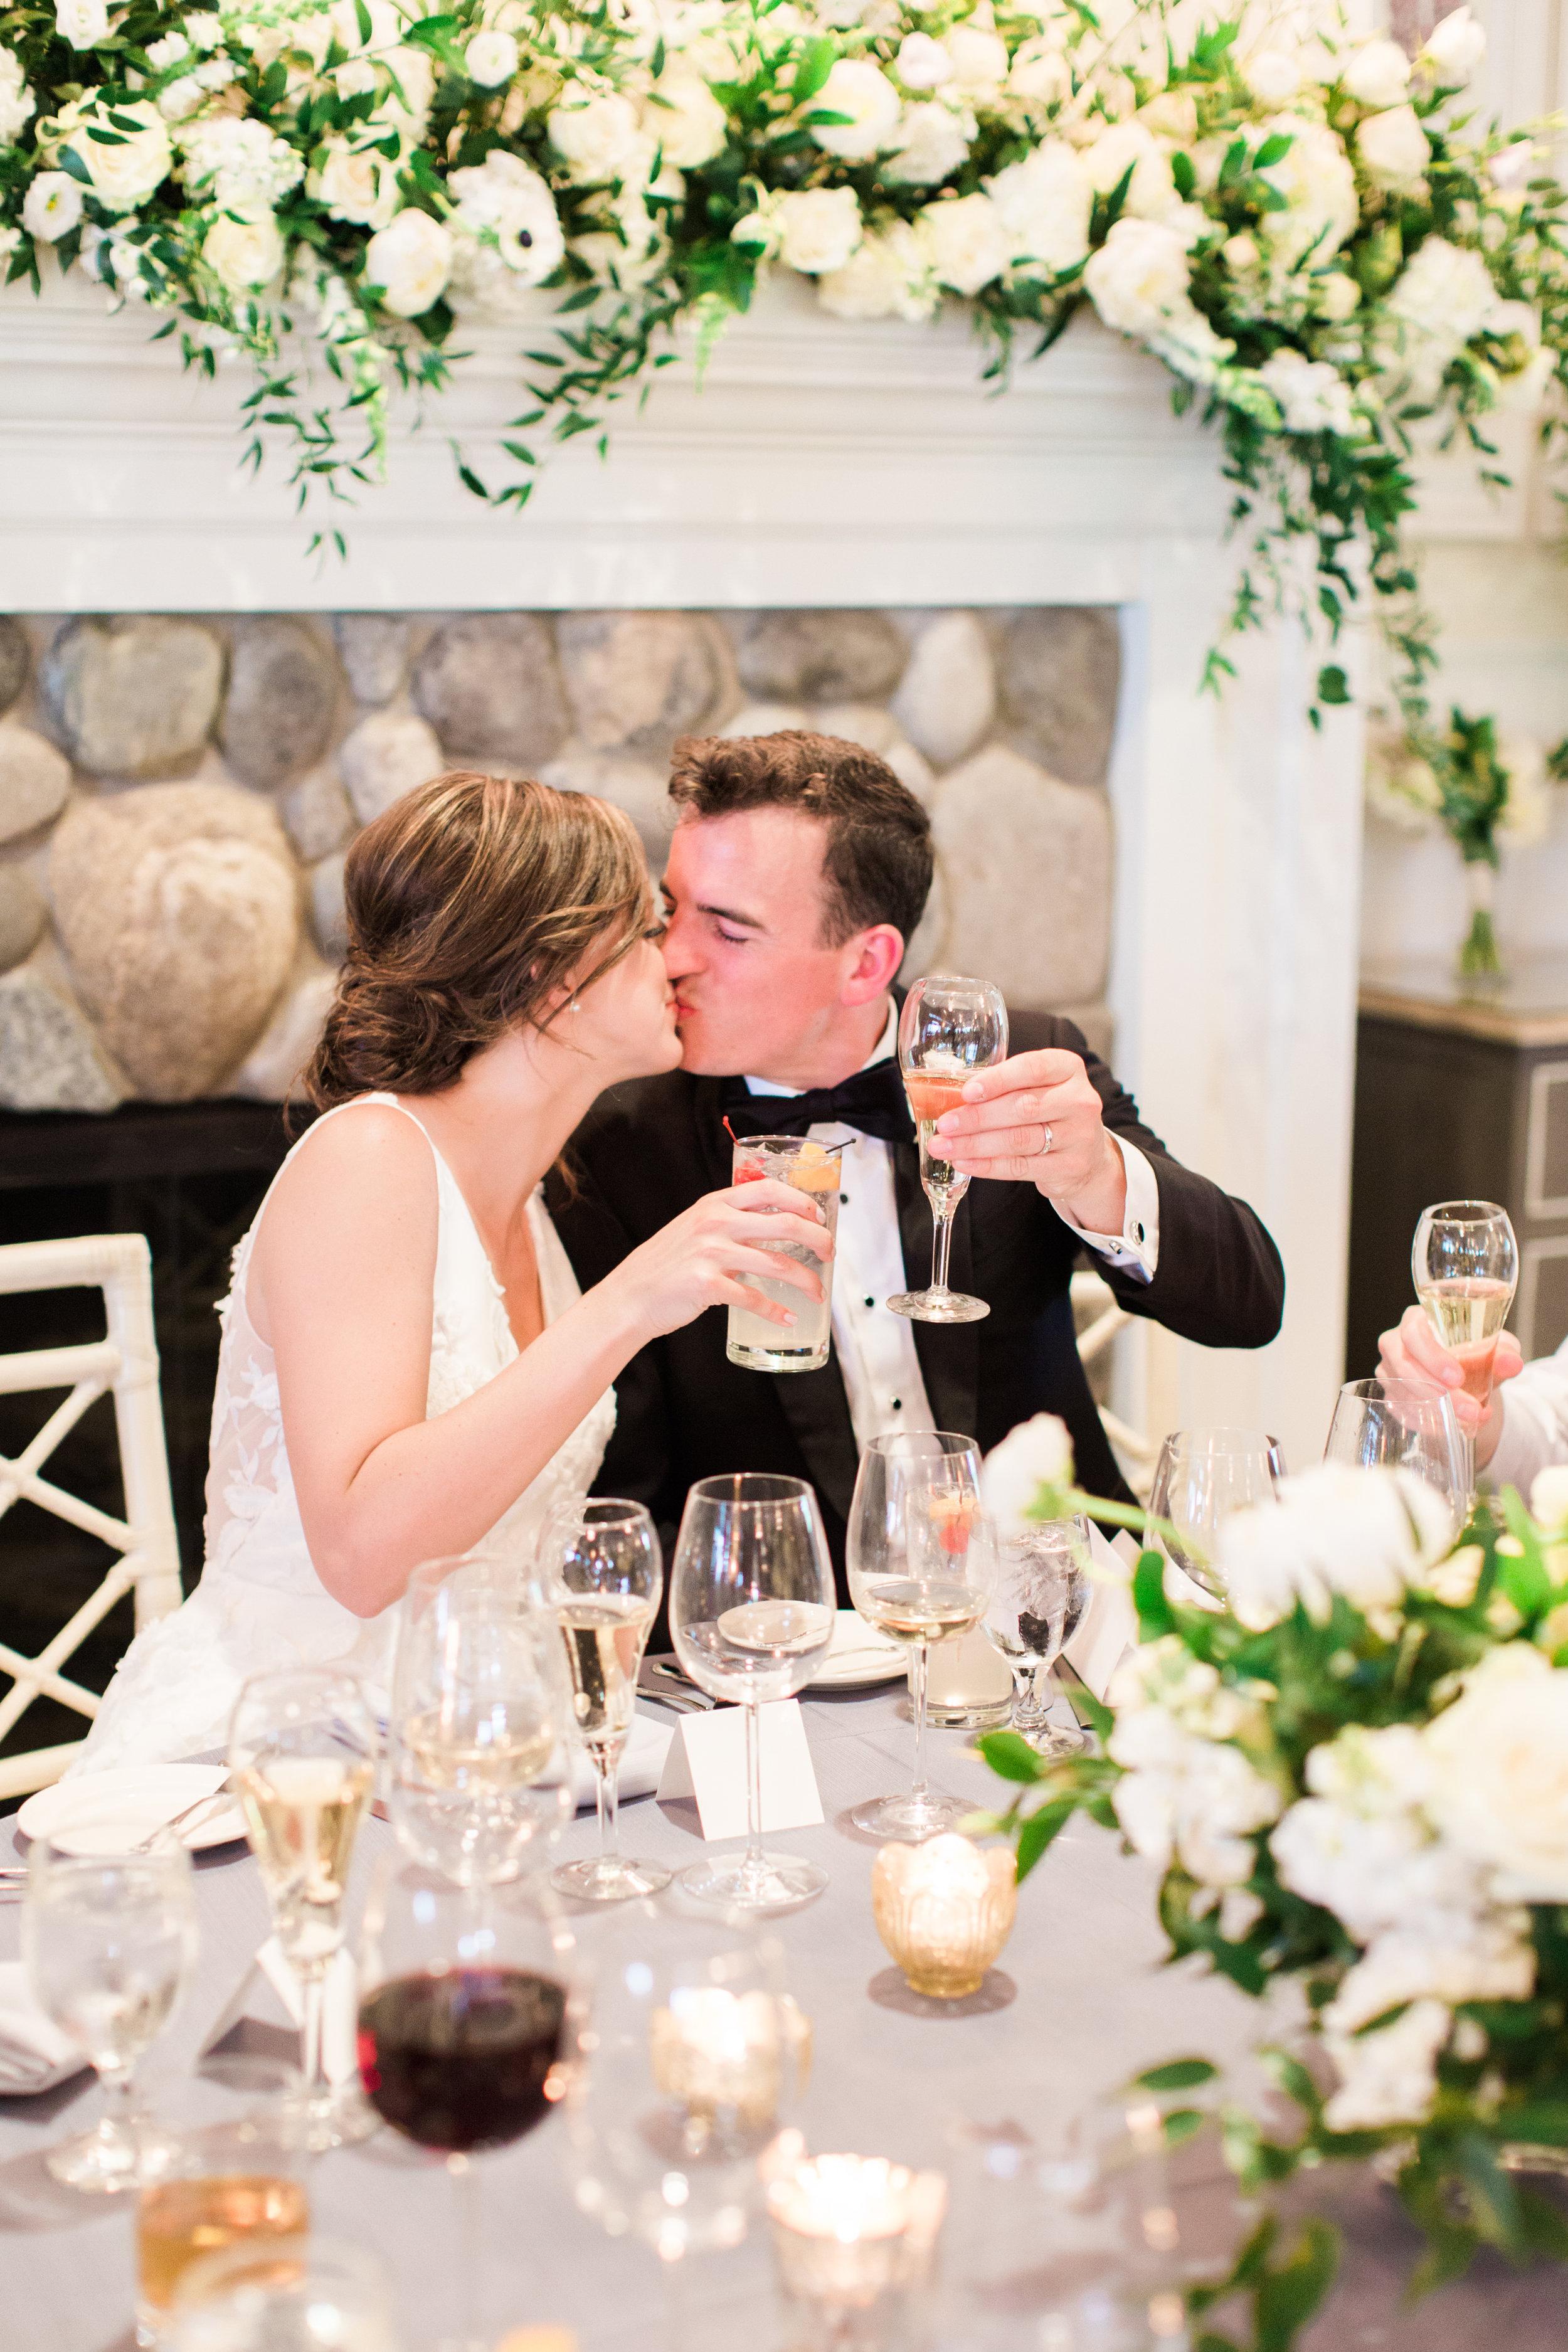 DeGuilio+Wedding+Reception-90.jpg